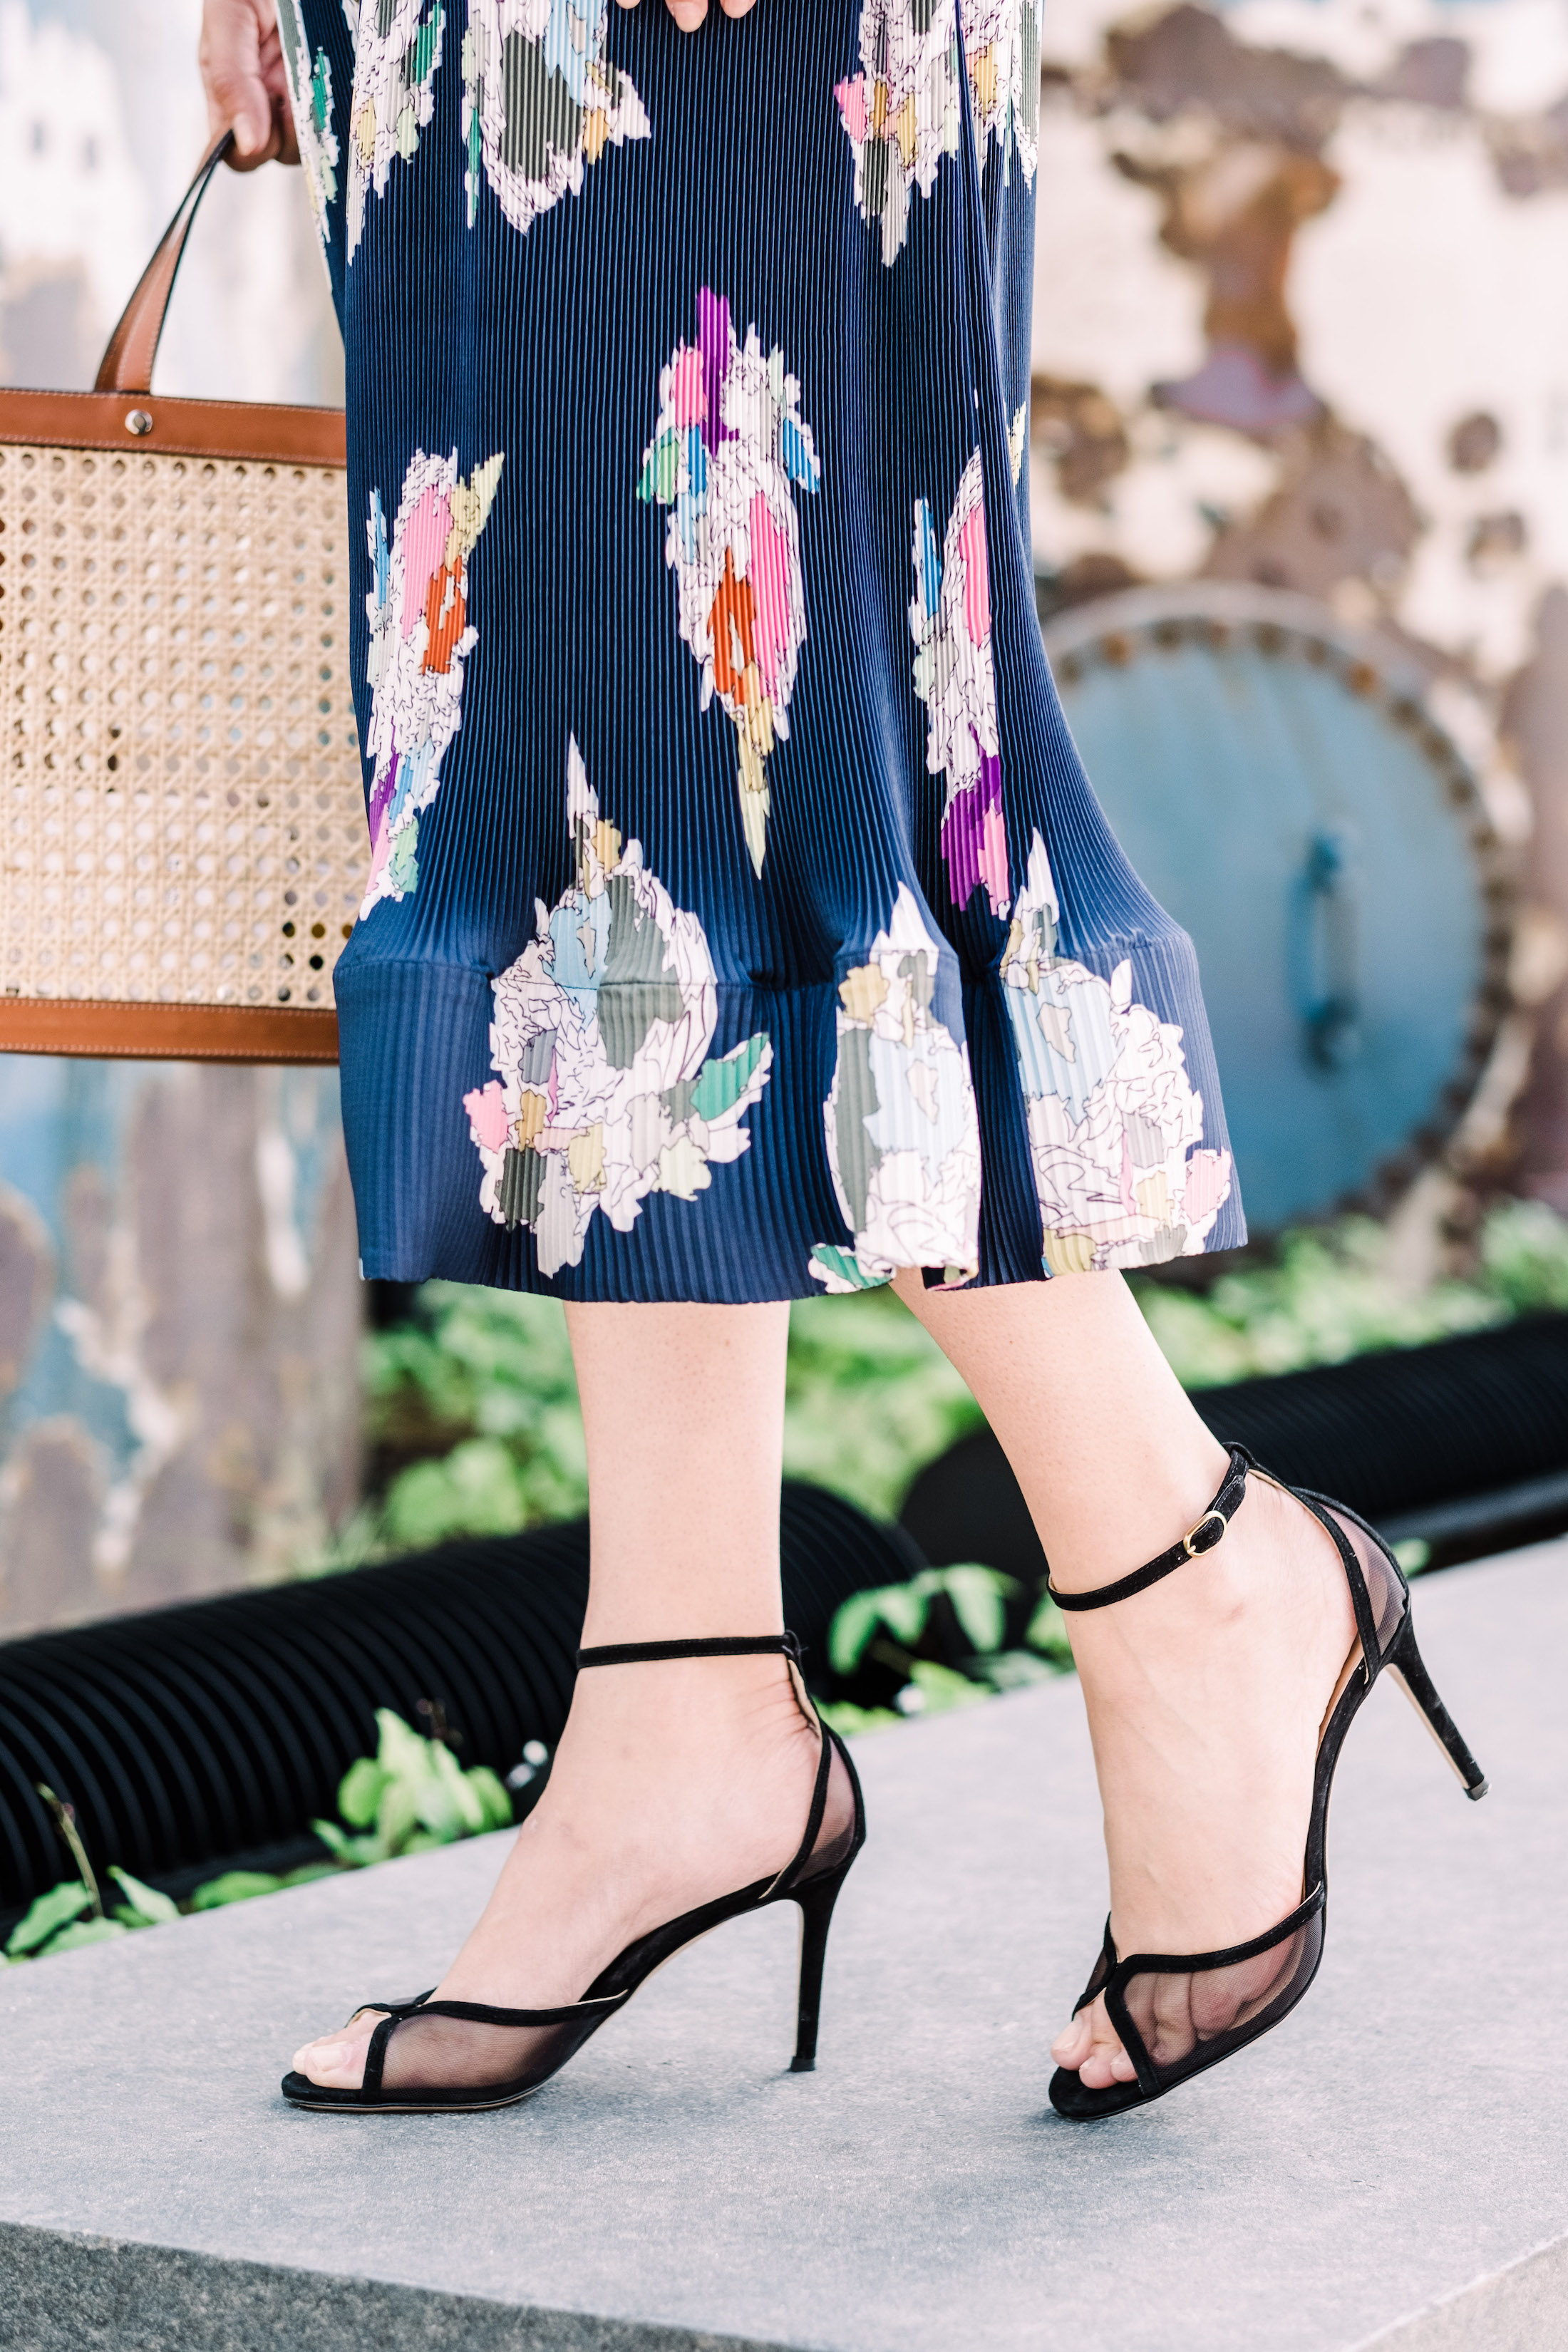 MARION PARKE Lolita Sandal in Black